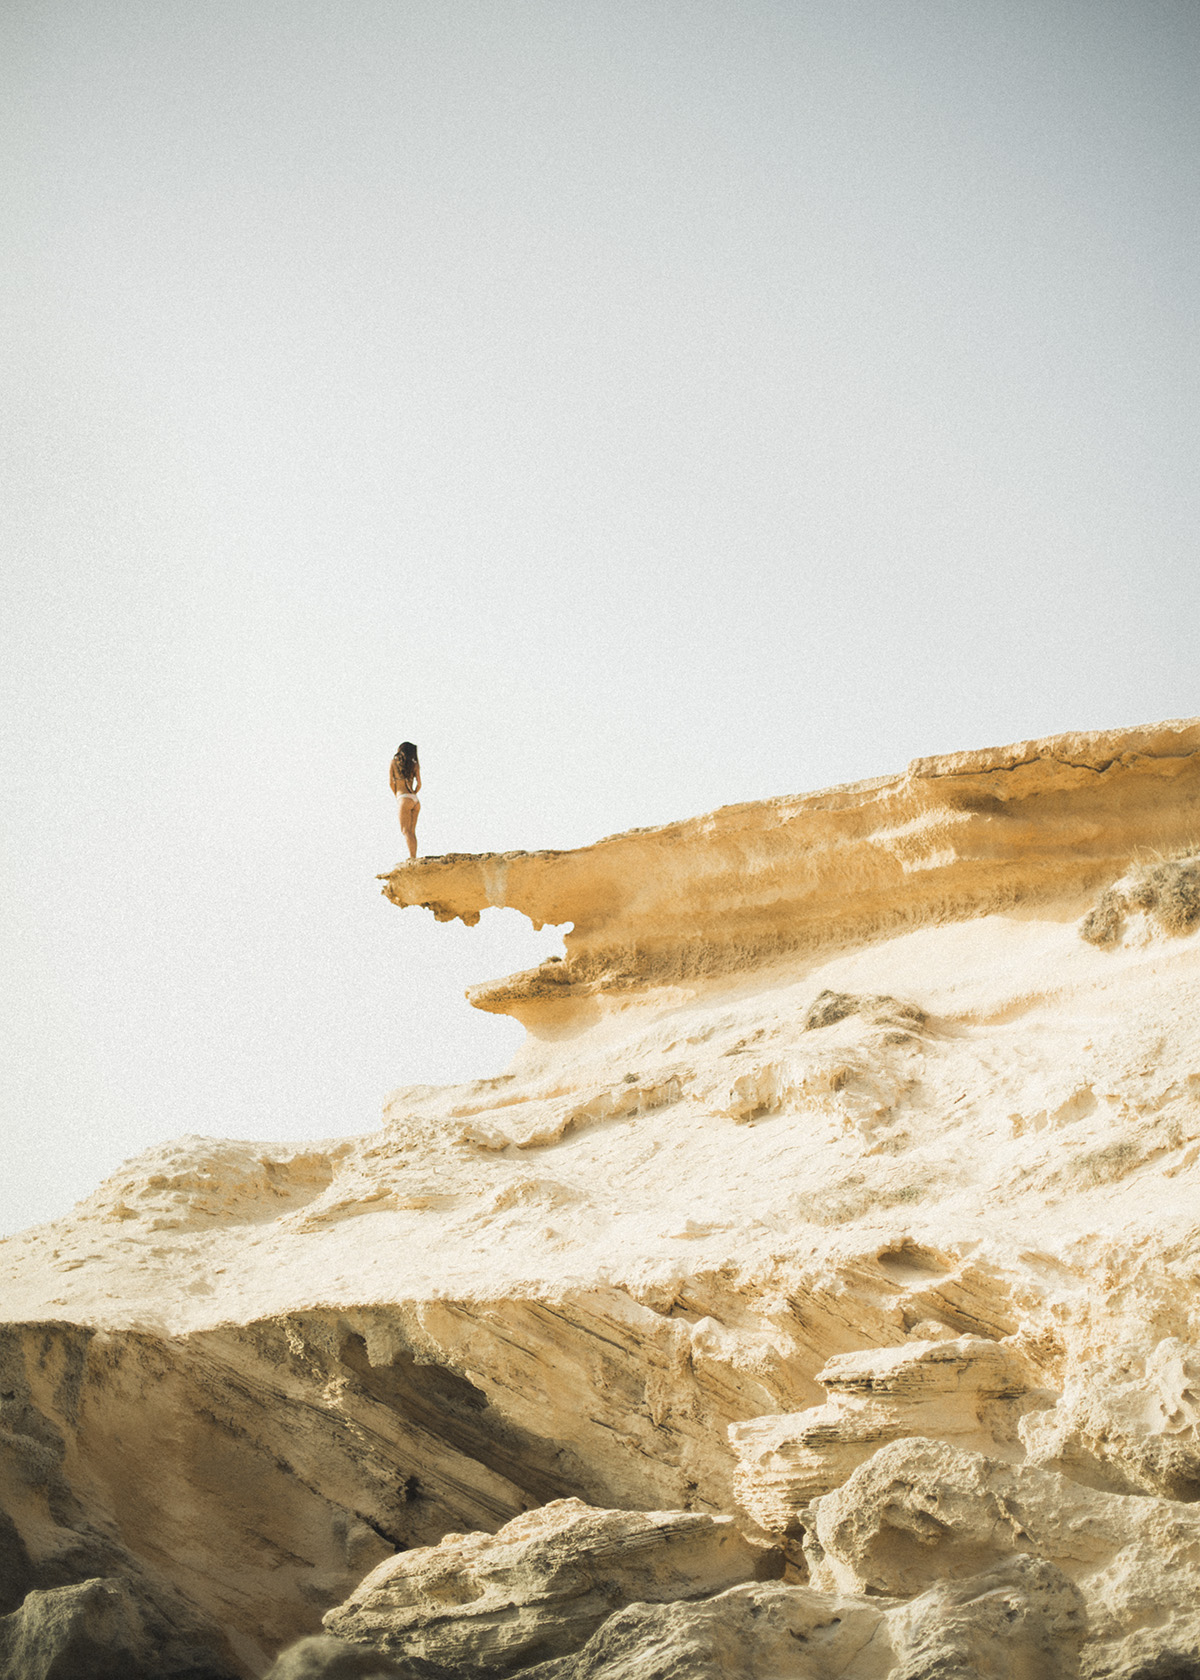 horizonte, acantilado, mar